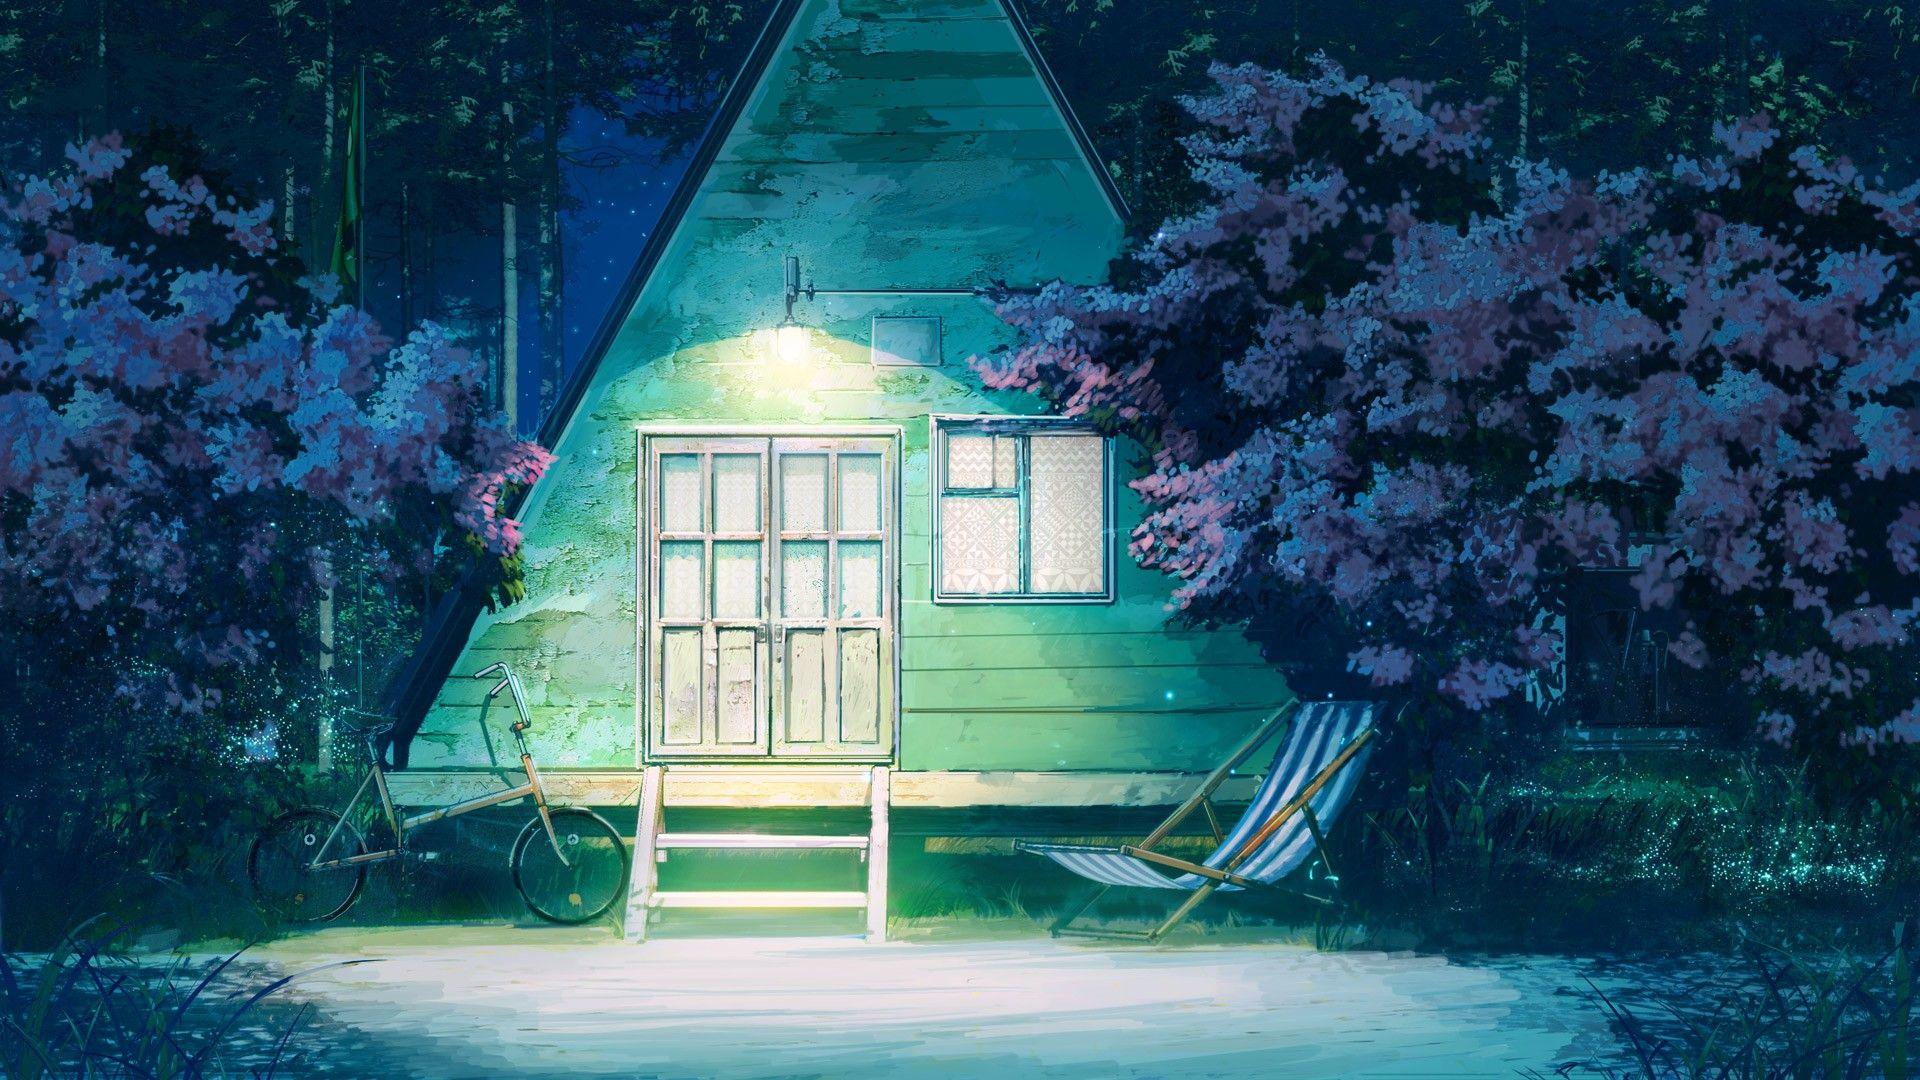 Lights Hammocks Starry Night Everlasting Summer Arsenixc Triangle Bicycle Trees Wallpaper Anime Scenery Scenery Background Background